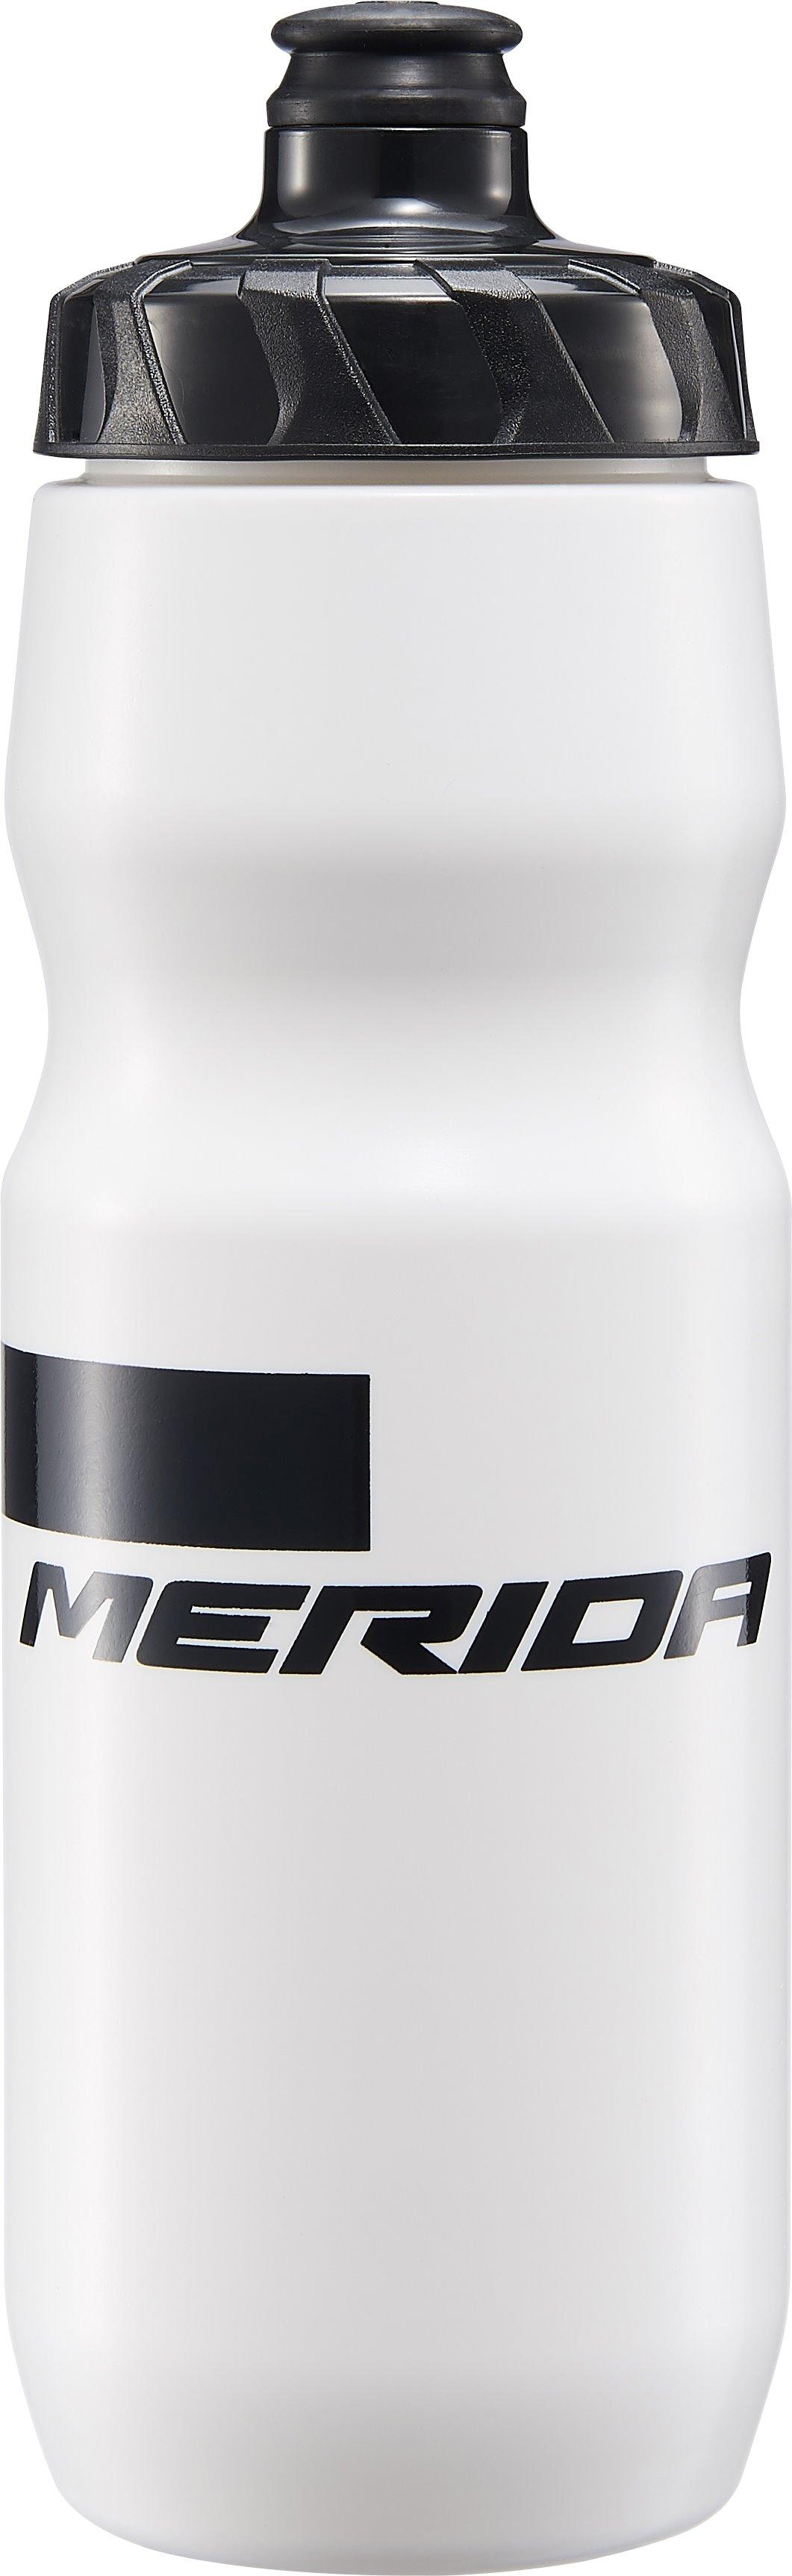 Merida 927 bílá/černá 750 ml